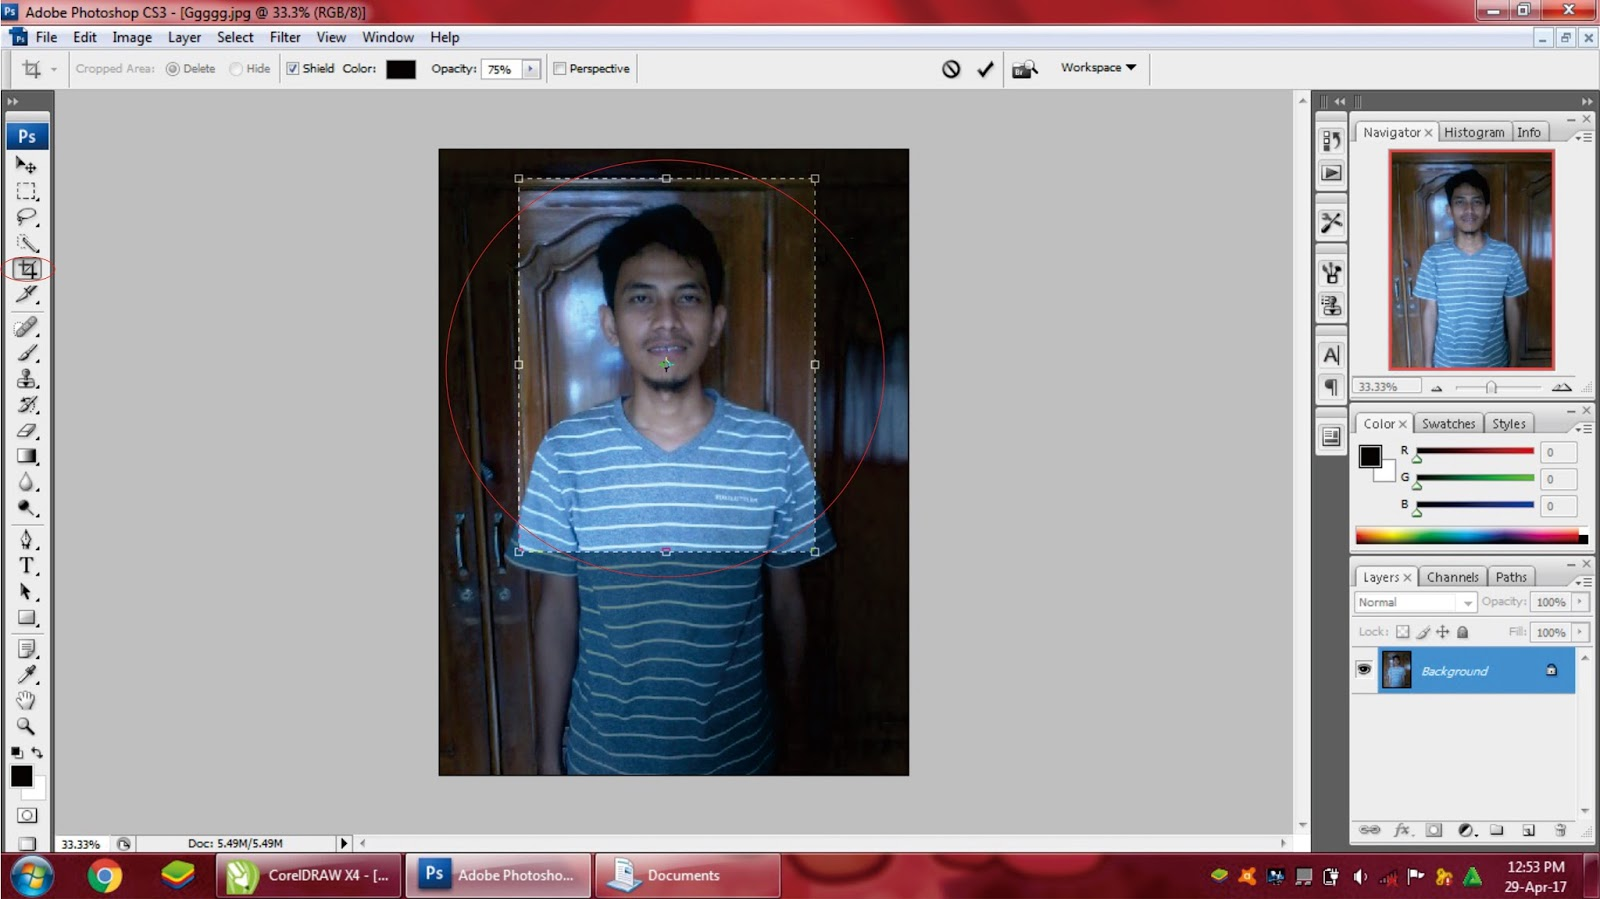 35+ Ide Cara Ganti Background Foto Corel Draw X4 - Cosy ...